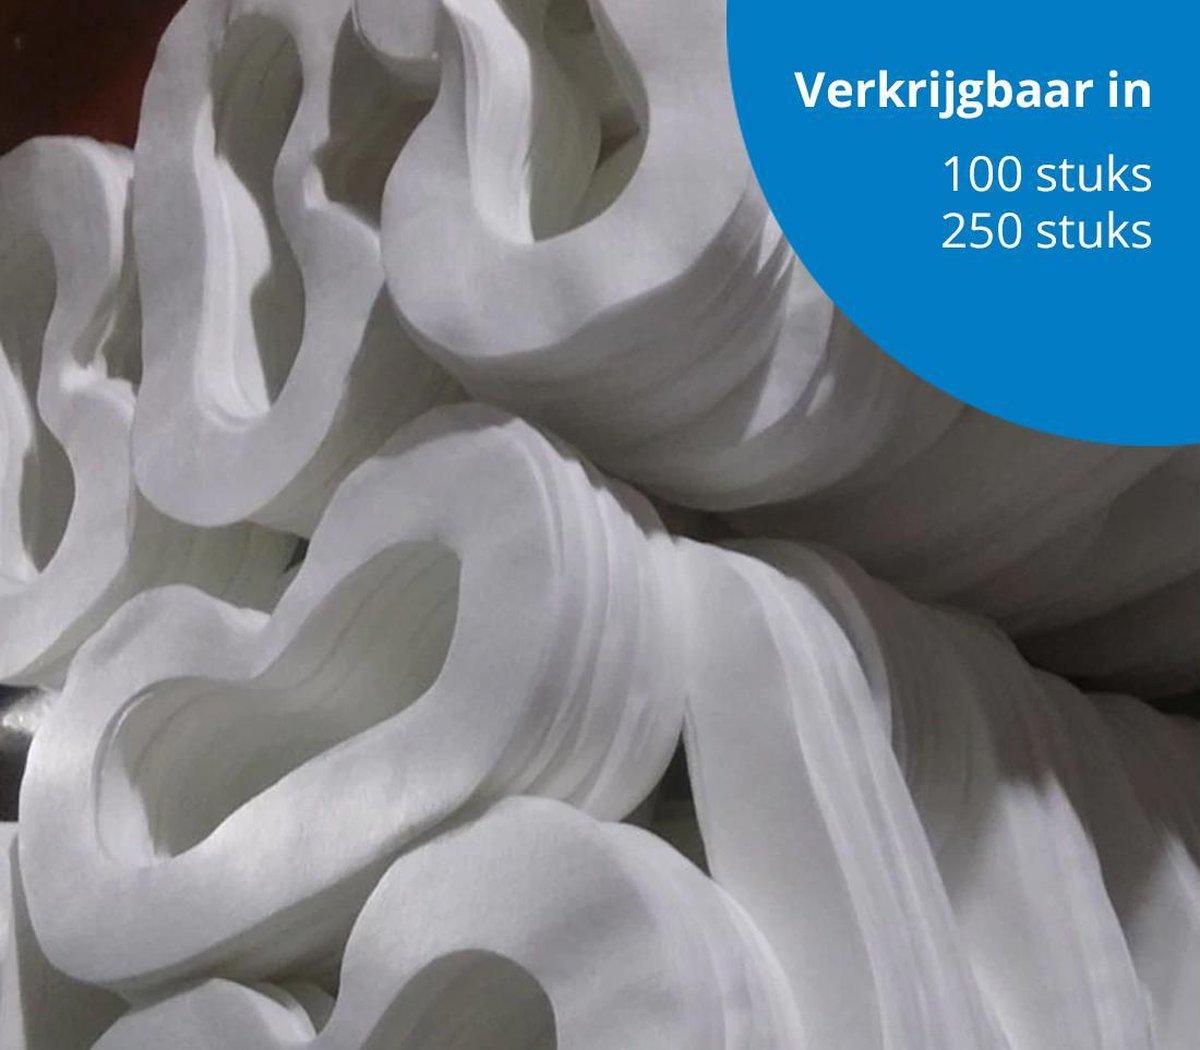 Hygiënemasker HTC Vive | Navulling 100 stuks voor sponsmasker kopen